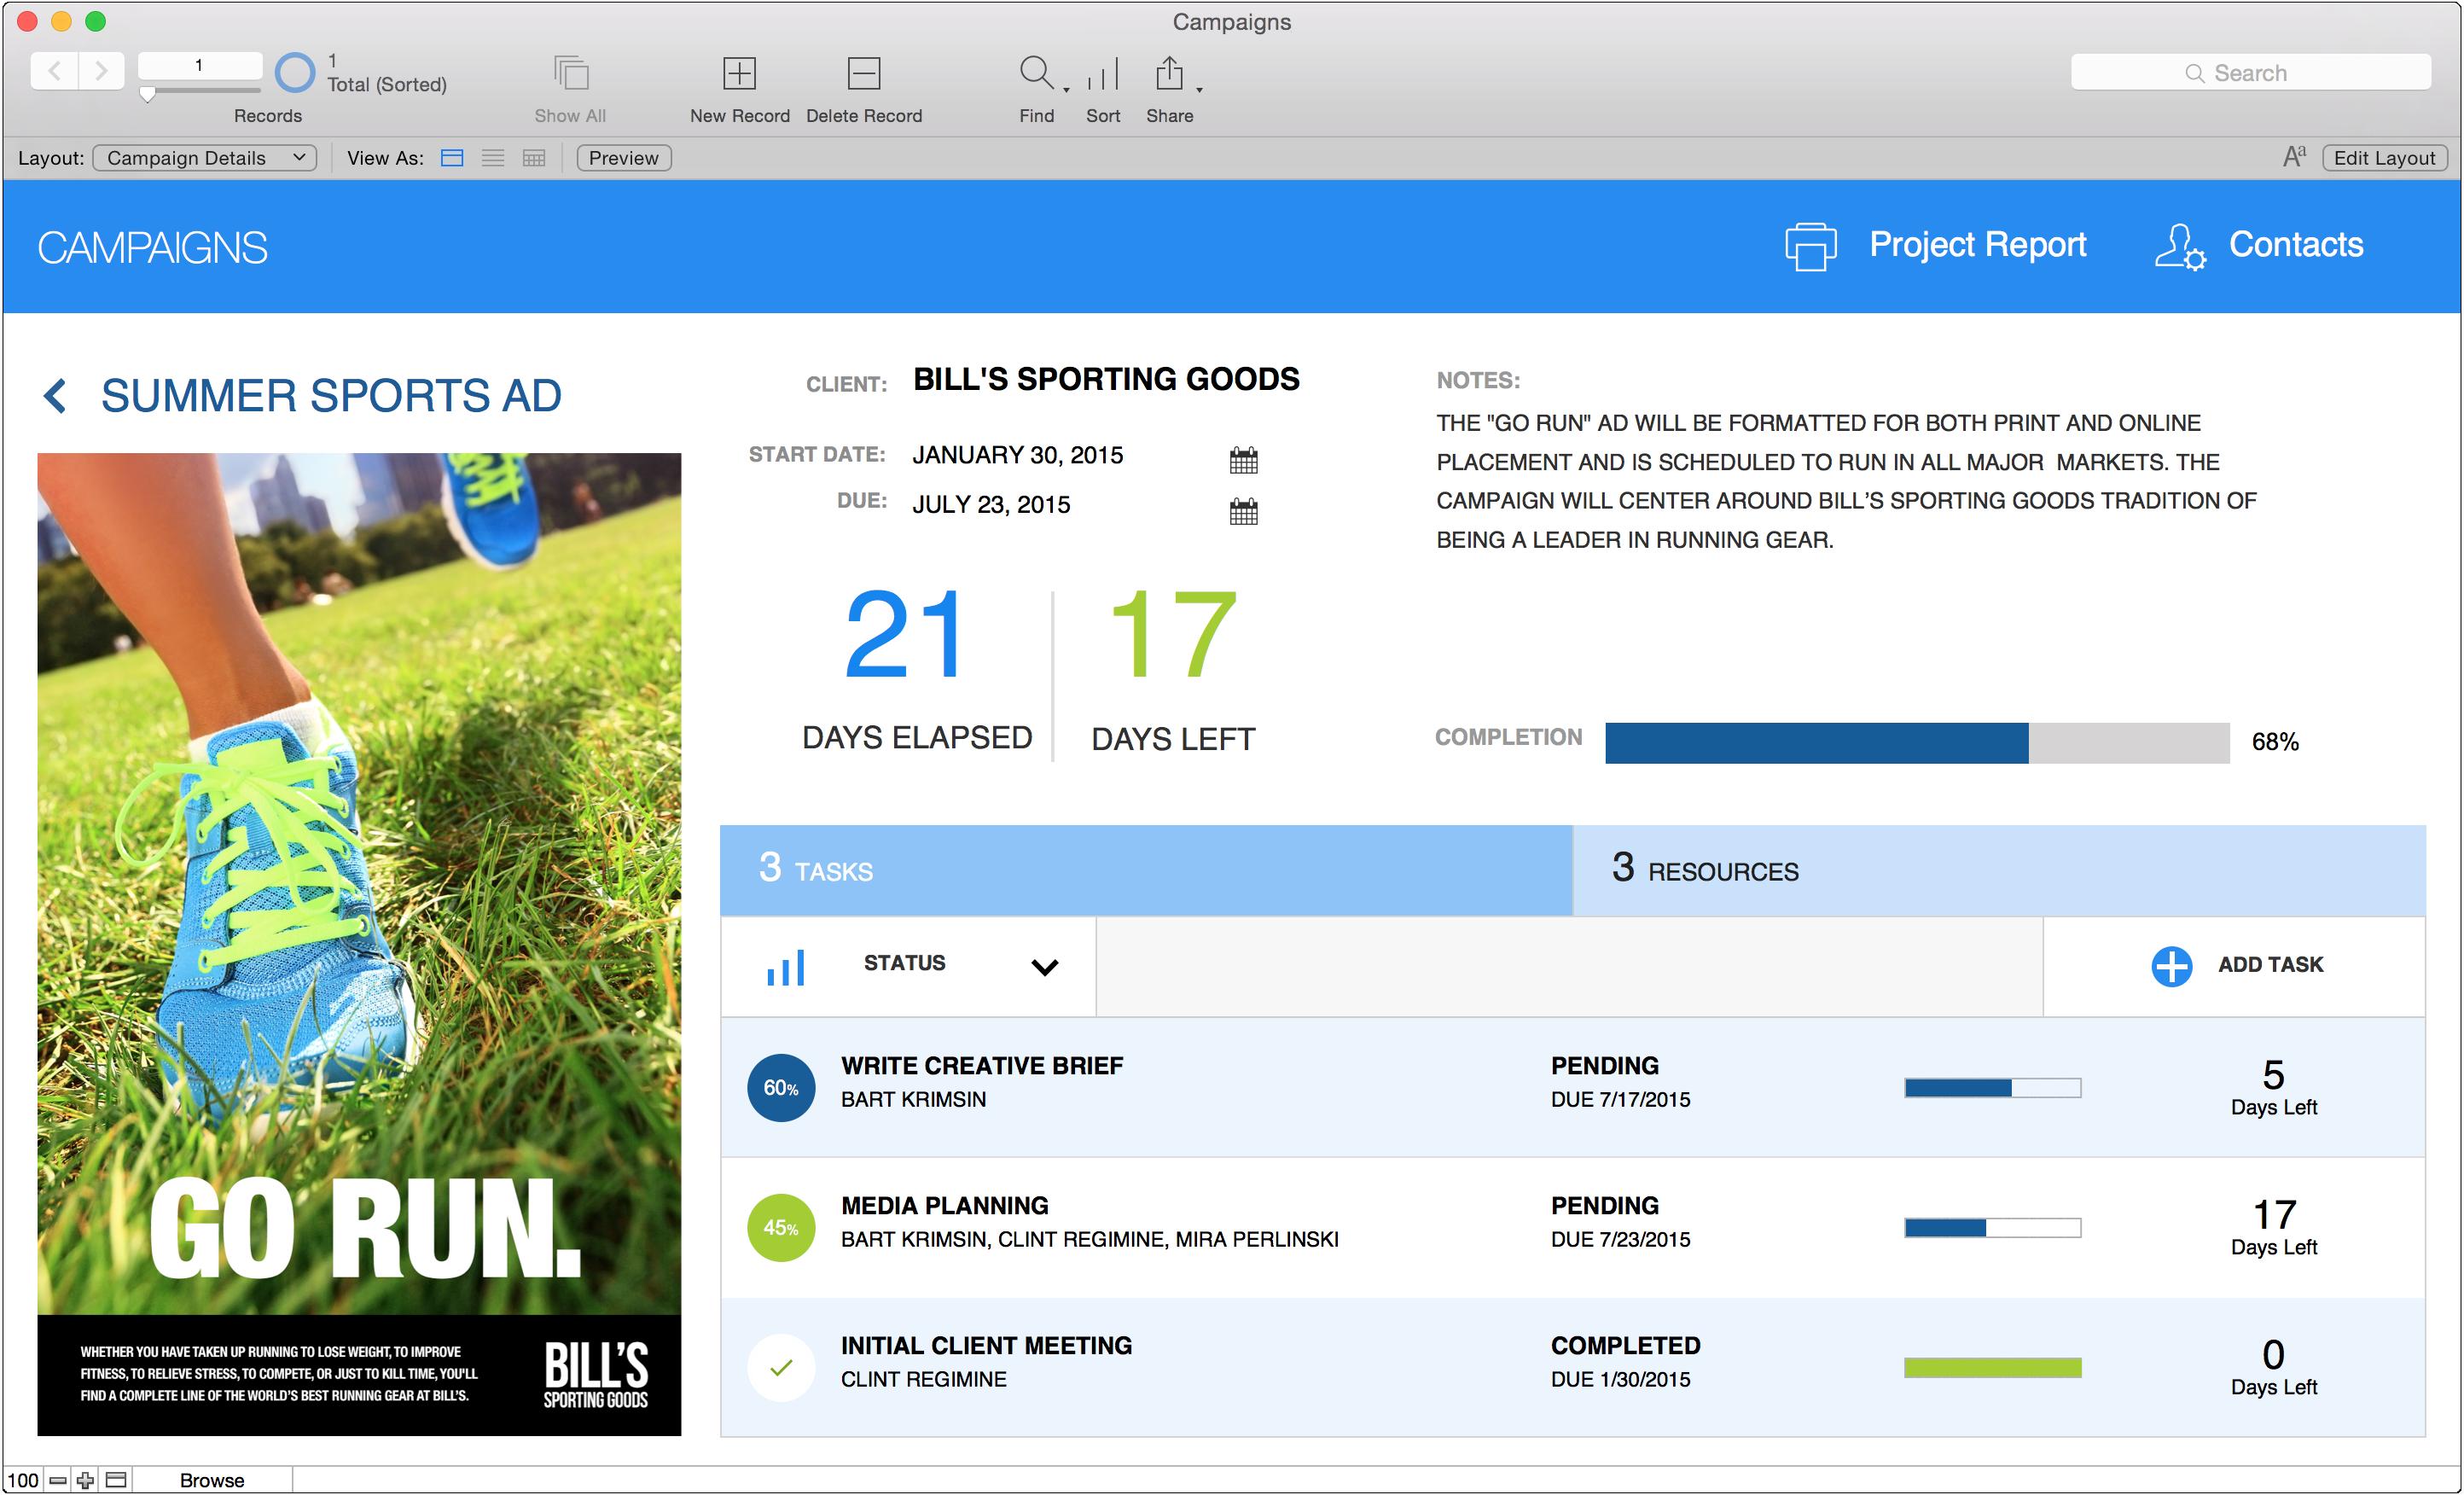 Filemaker pro 14 upgrade download mac download best for Filemaker go templates